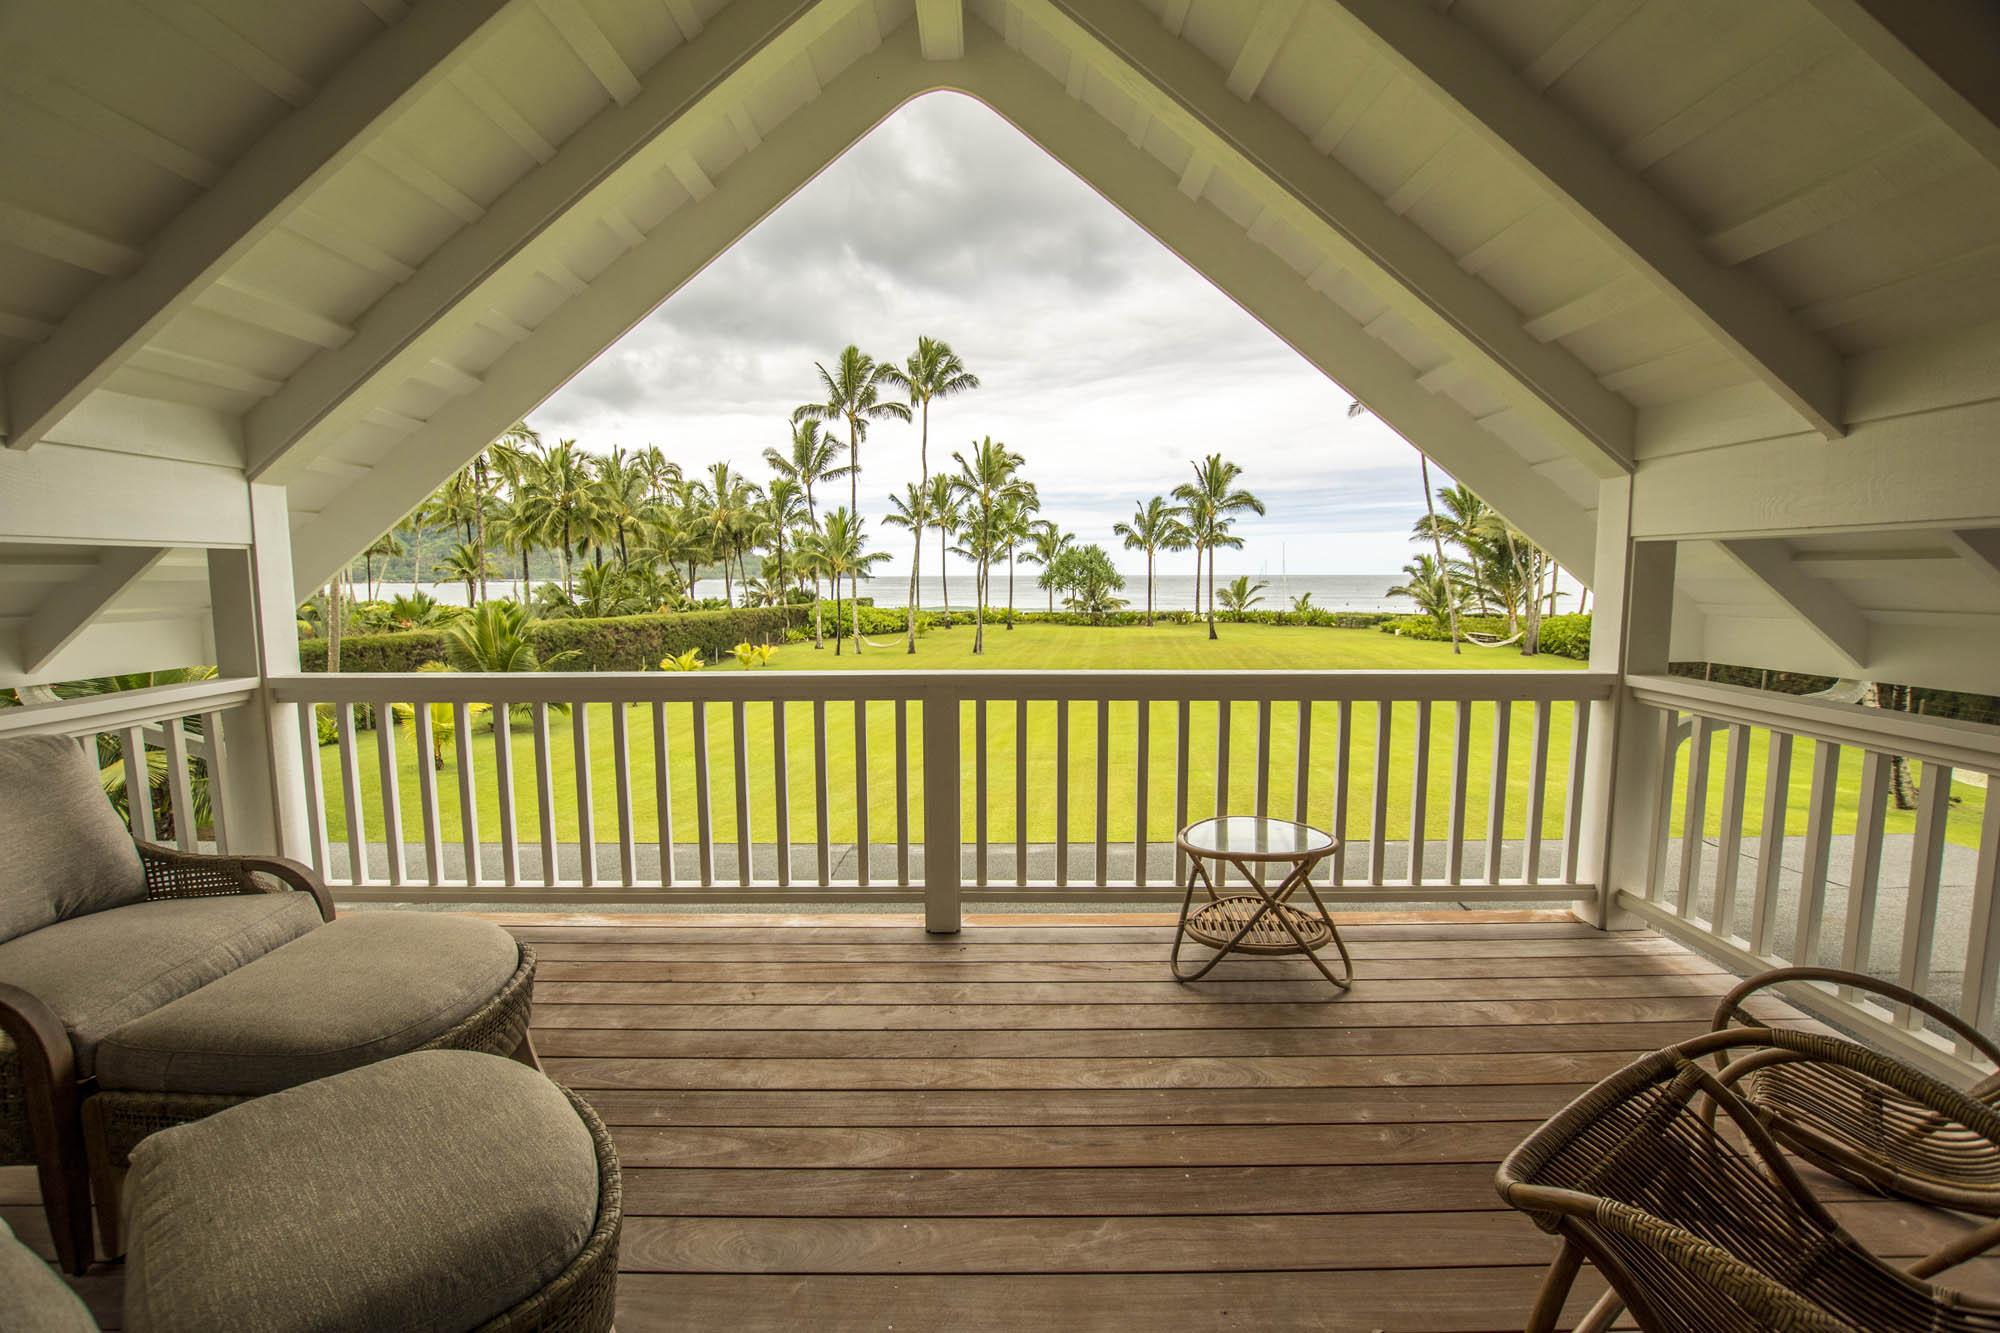 Kauai-217-Hanalei Bay13